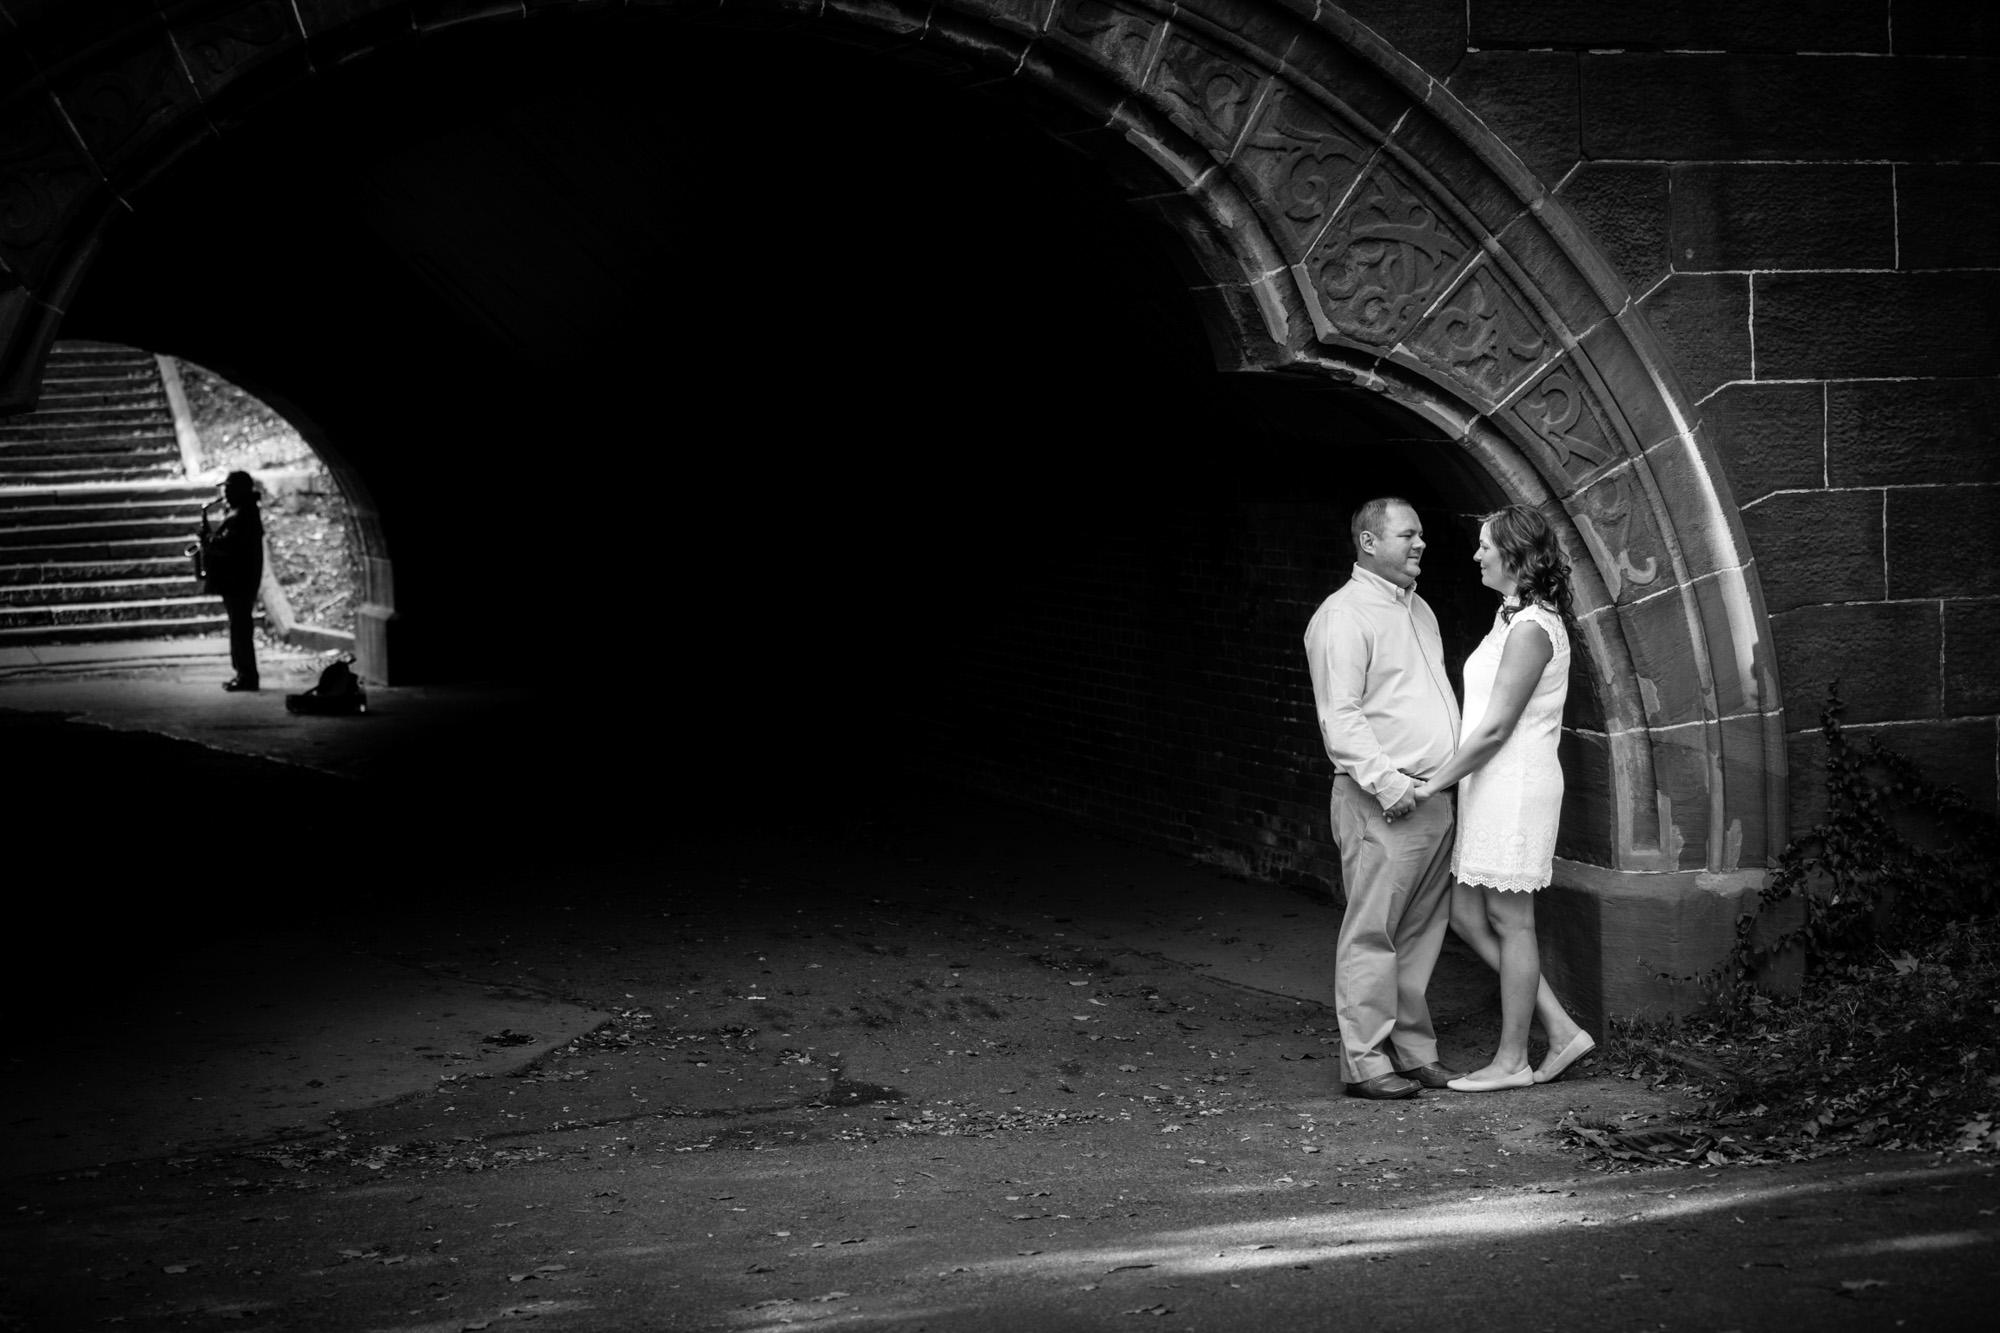 scranton_wedding_photographer_lettieri_pa (2 of 12).jpg